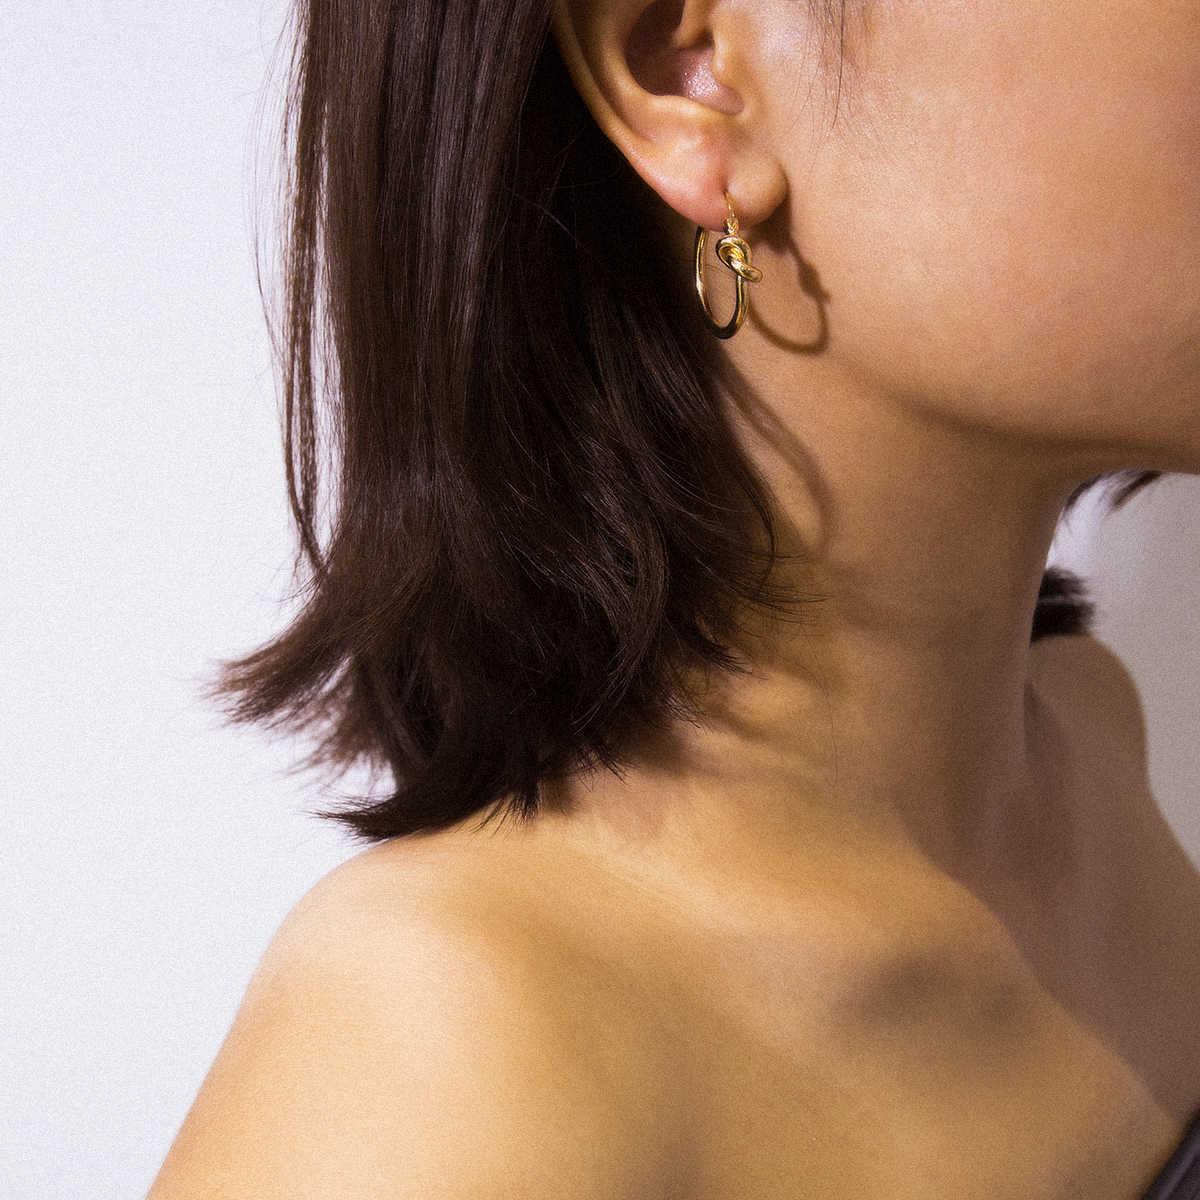 Ingemark Punk อินเดียงูรูปร่าง Hoop ต่างหูผู้หญิงที่ดีที่สุด Aros Steampunk รอบวงกลม Hoop ต่างหู Brinco แฟชั่นเครื่องประดับหู